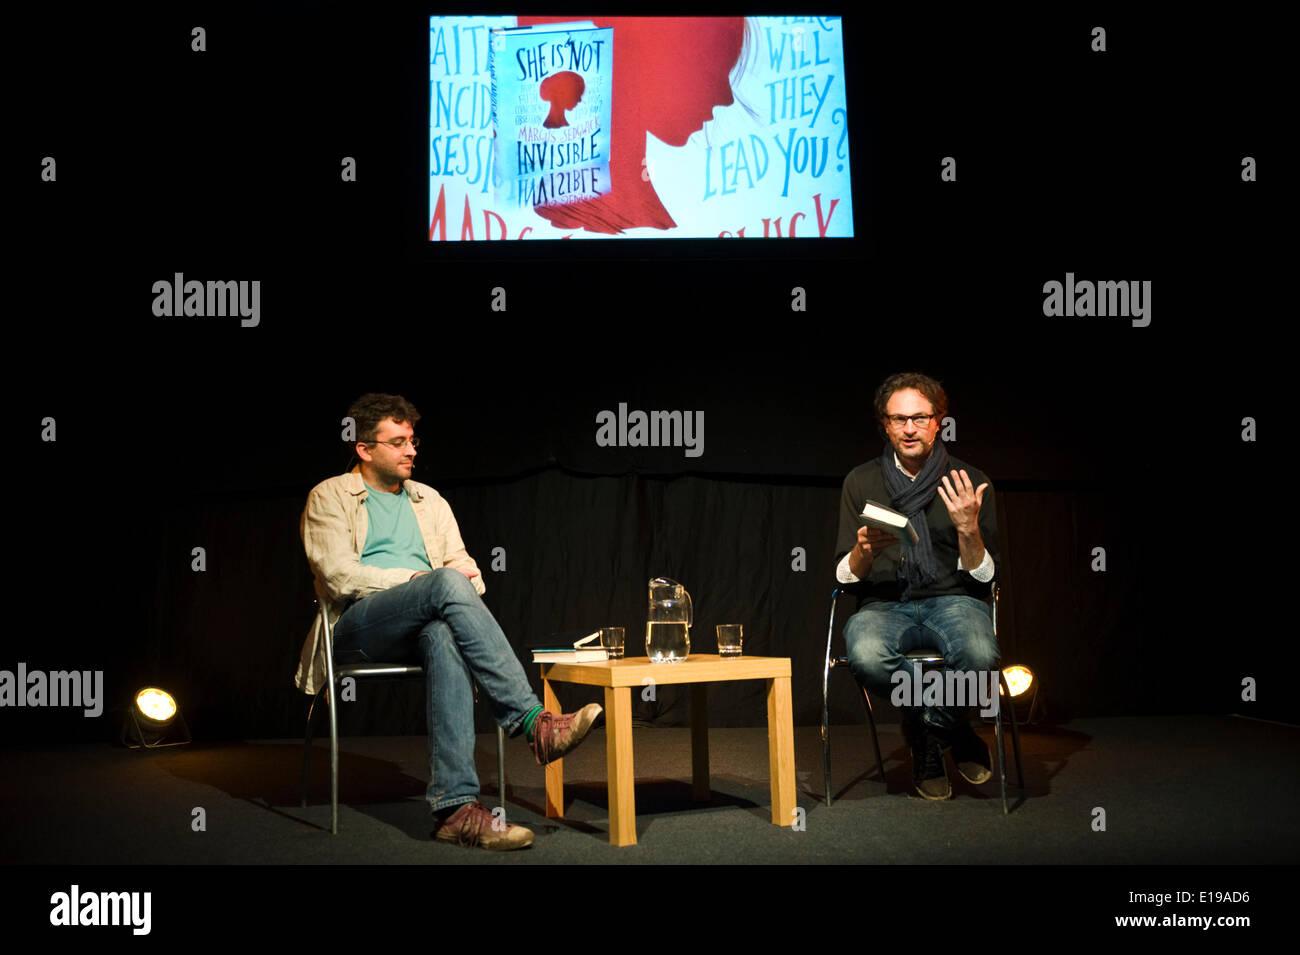 Marcus Sedgwick children's author & illustrator speaking at Hay Festival 2014  ©Jeff Morgan - Stock Image